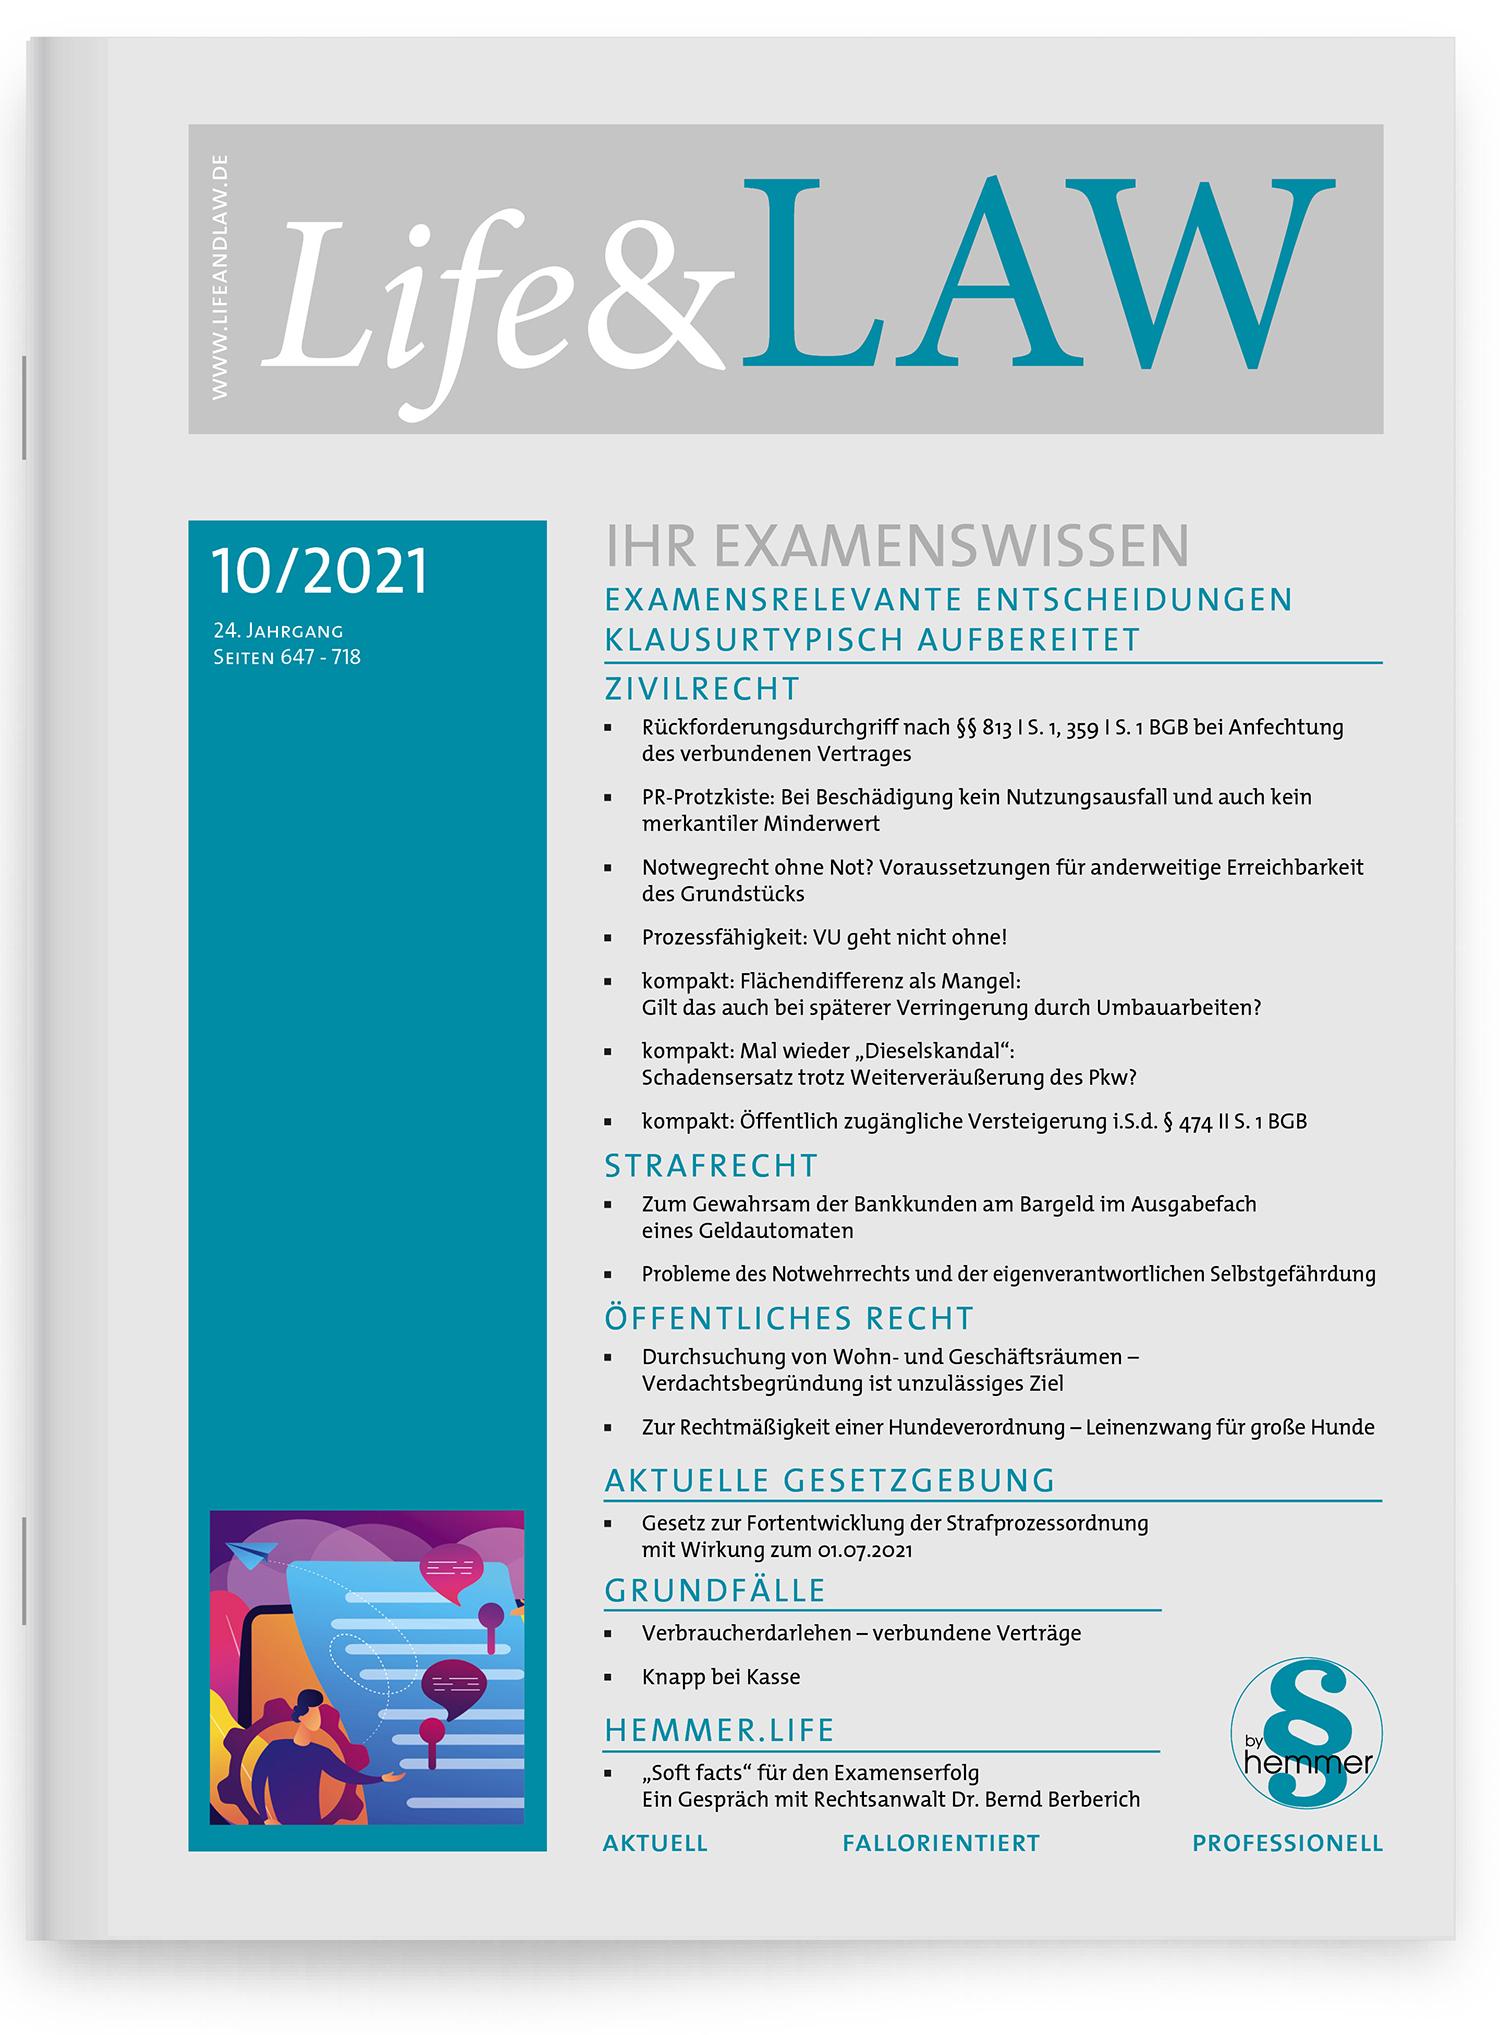 Life&LAW Ausgabe 2021/10